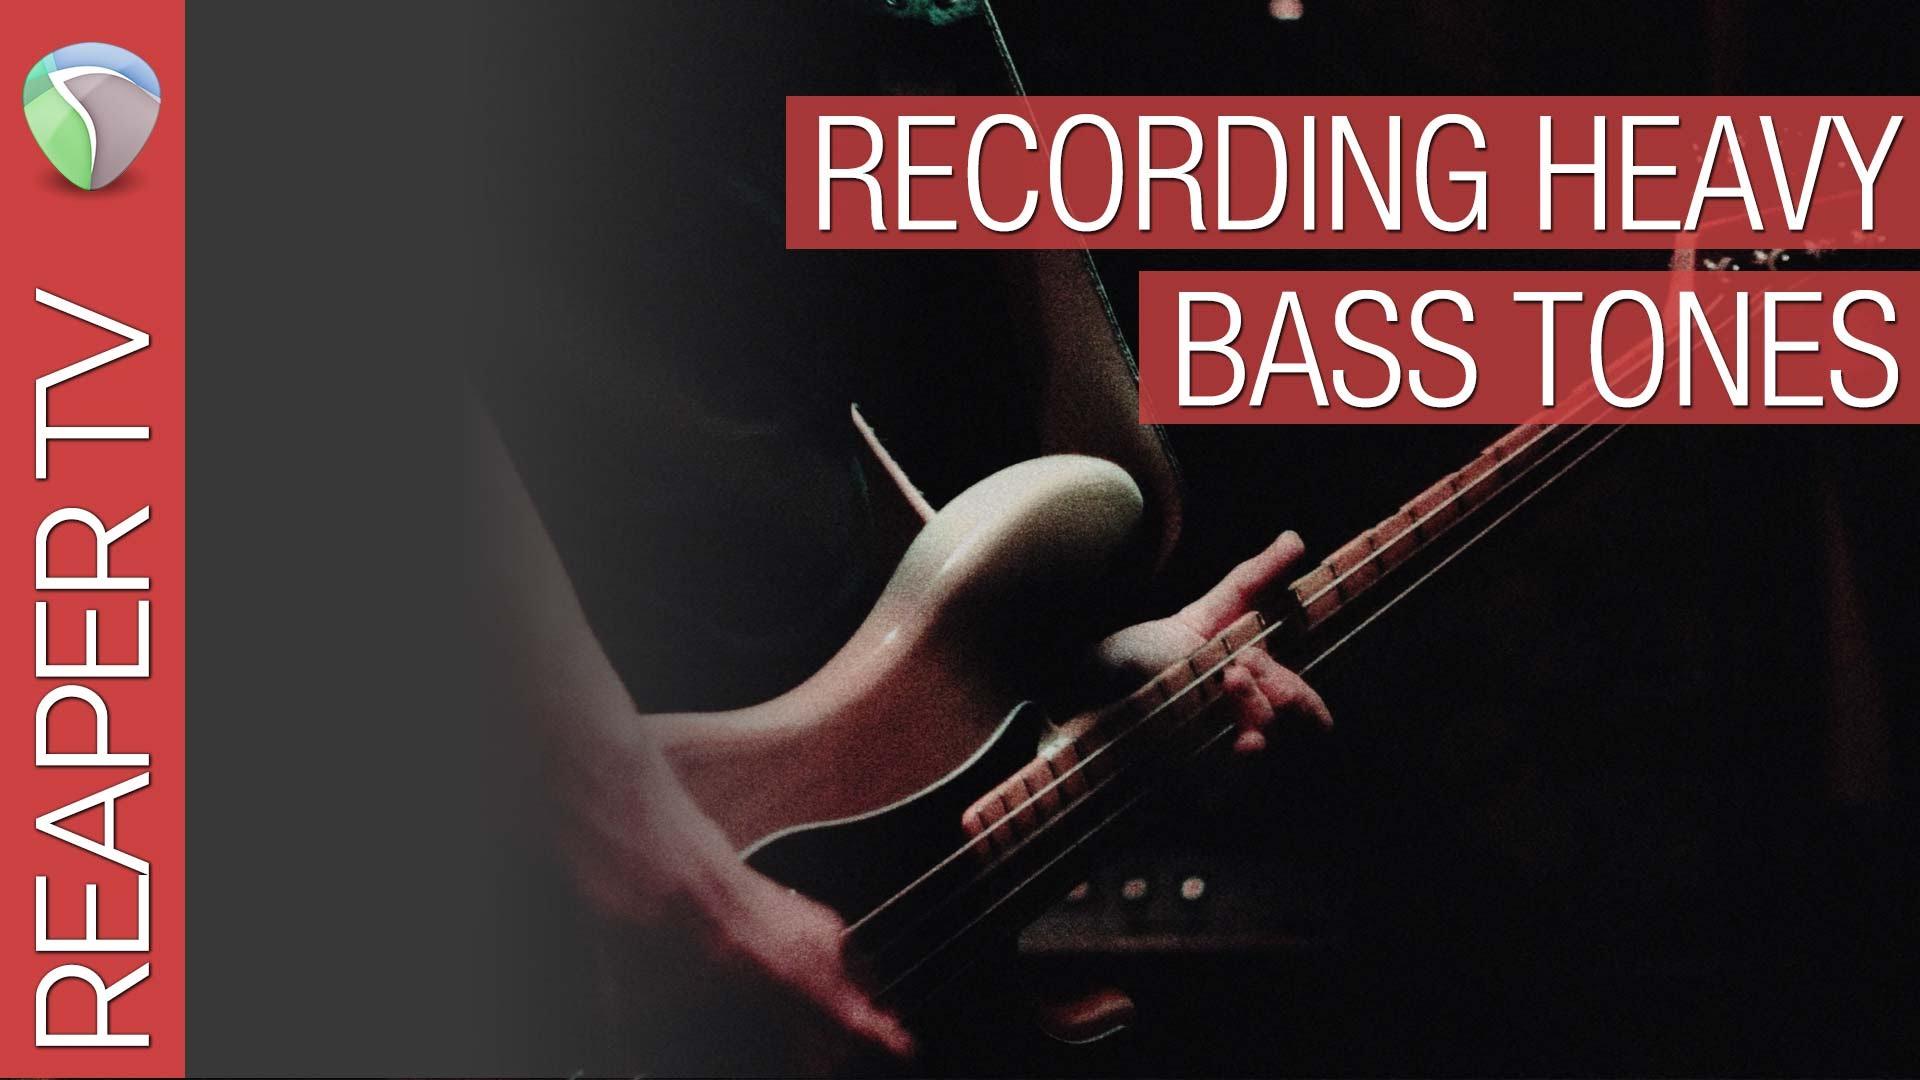 Recording & Mixing a Heavy Bass Tone